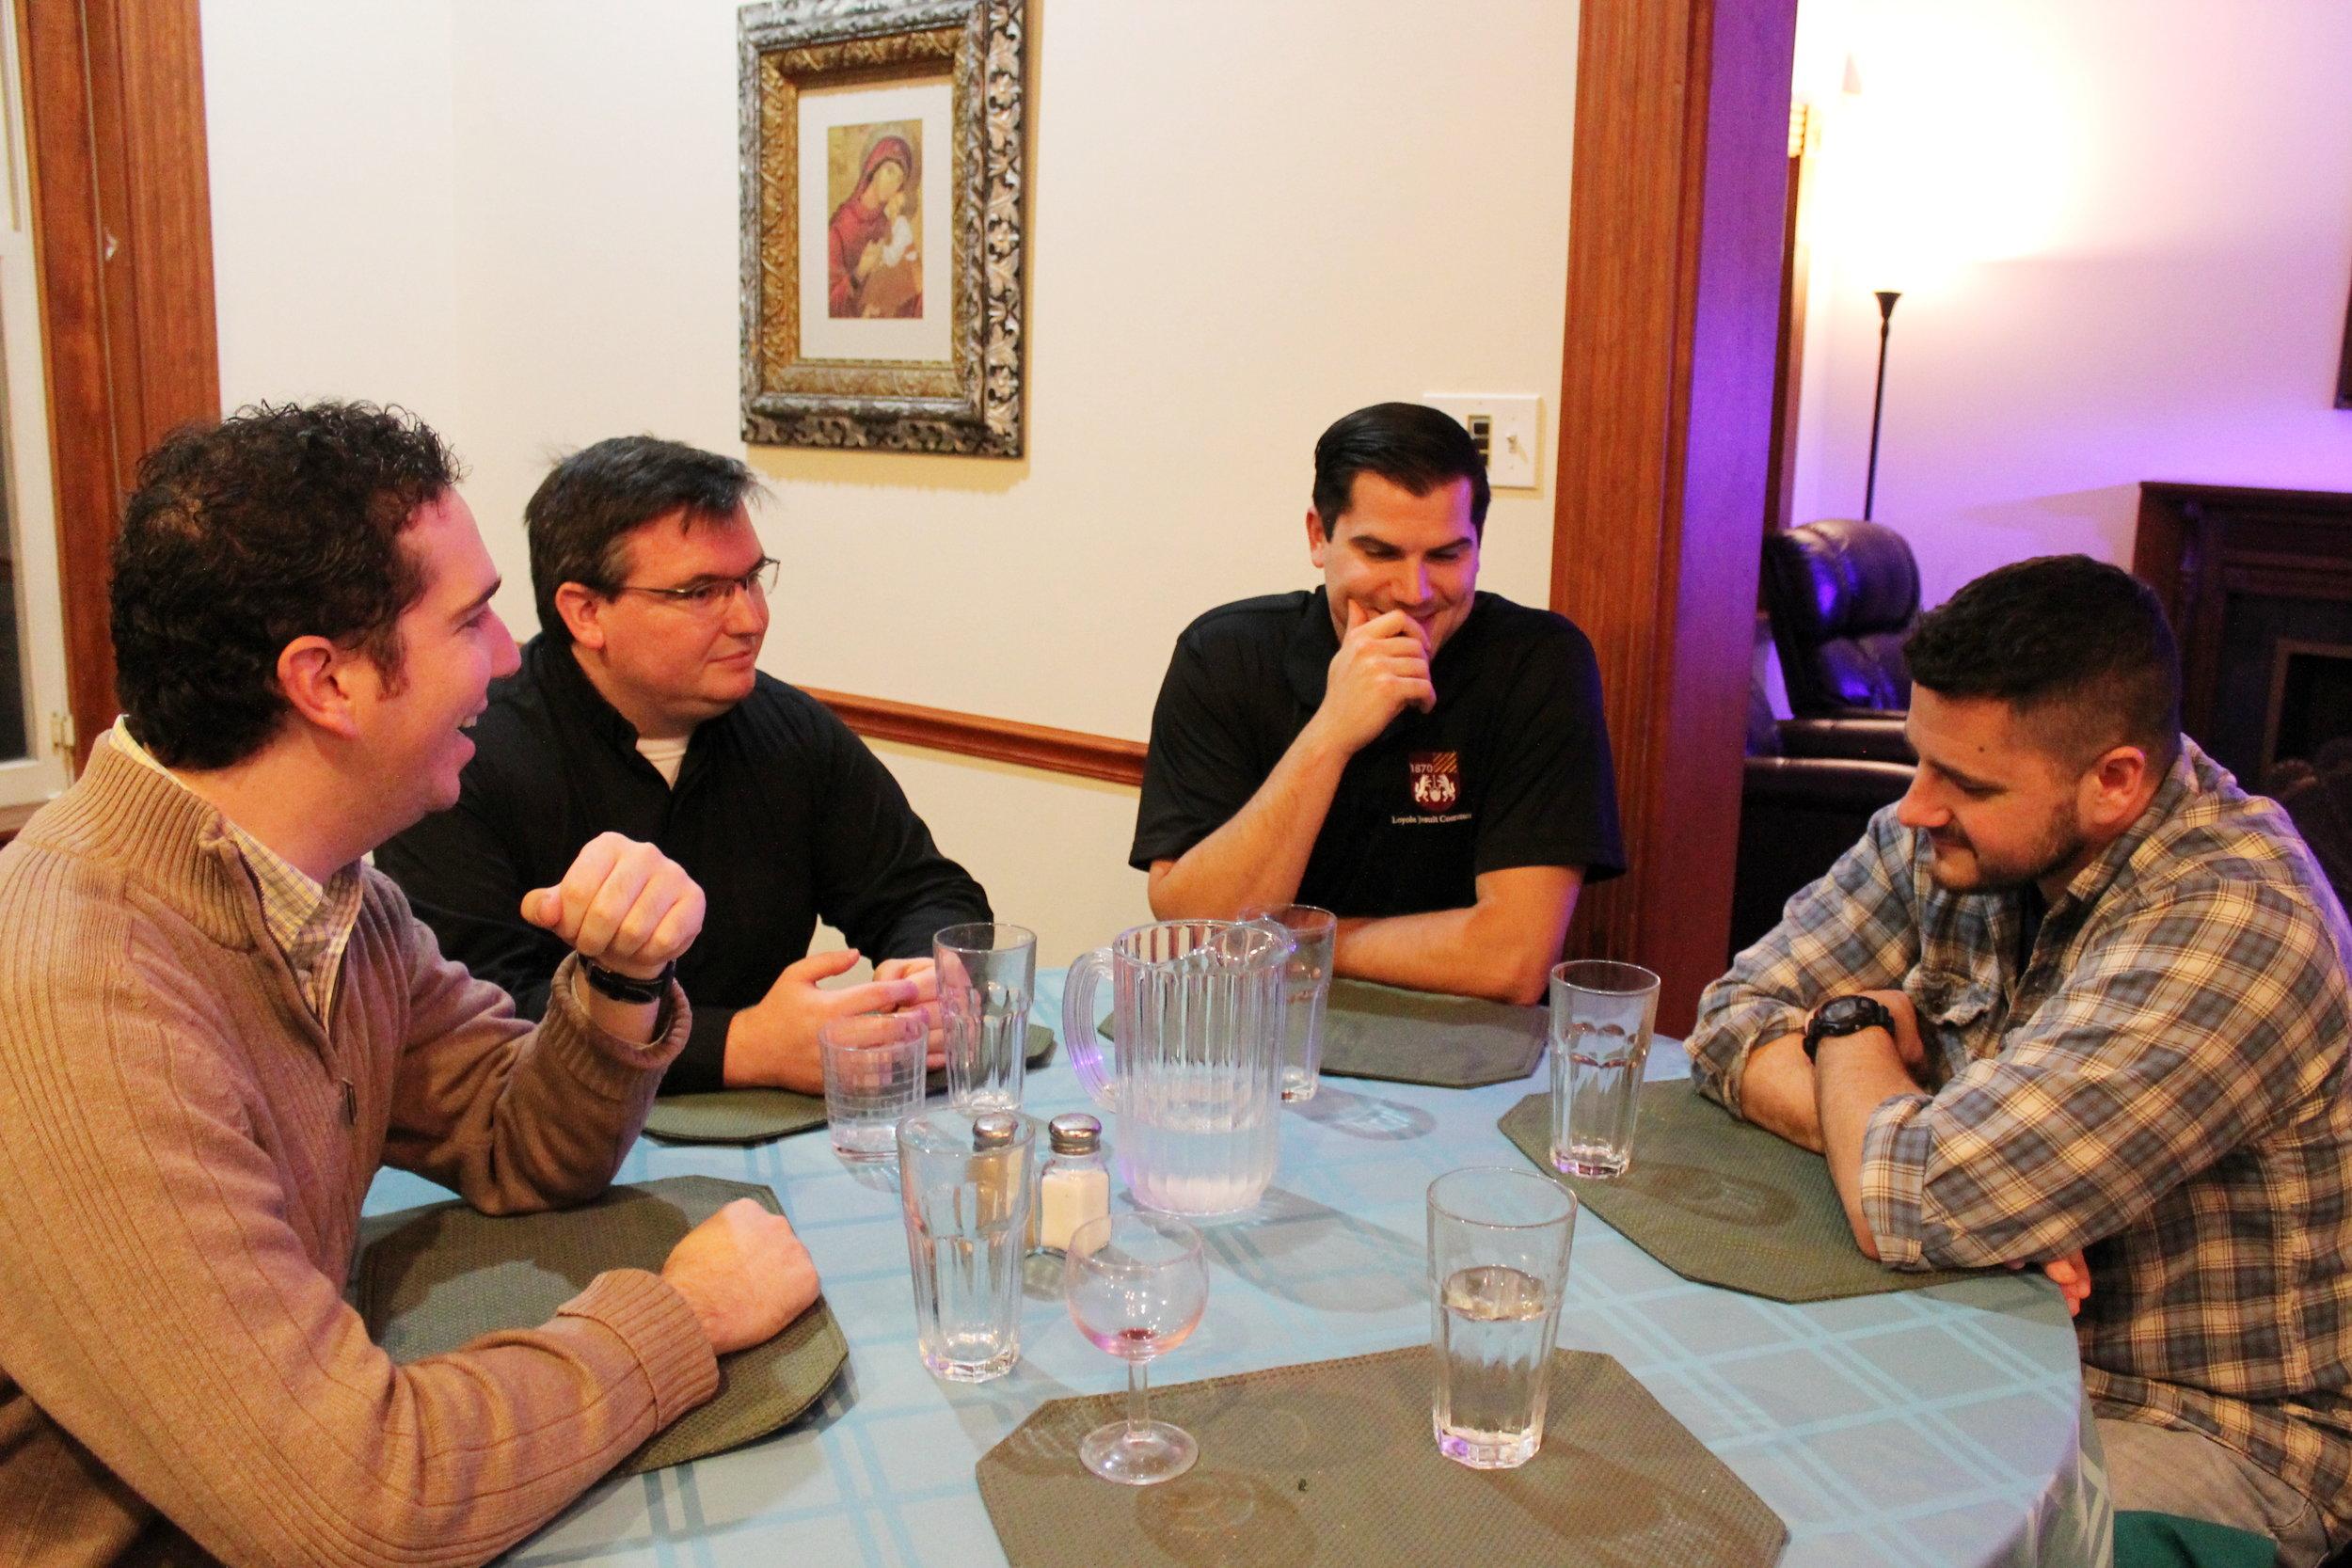 Jesuit scholastics enjoy dinner together at Bellarmine House (photo courtesy of Saint Louis University)